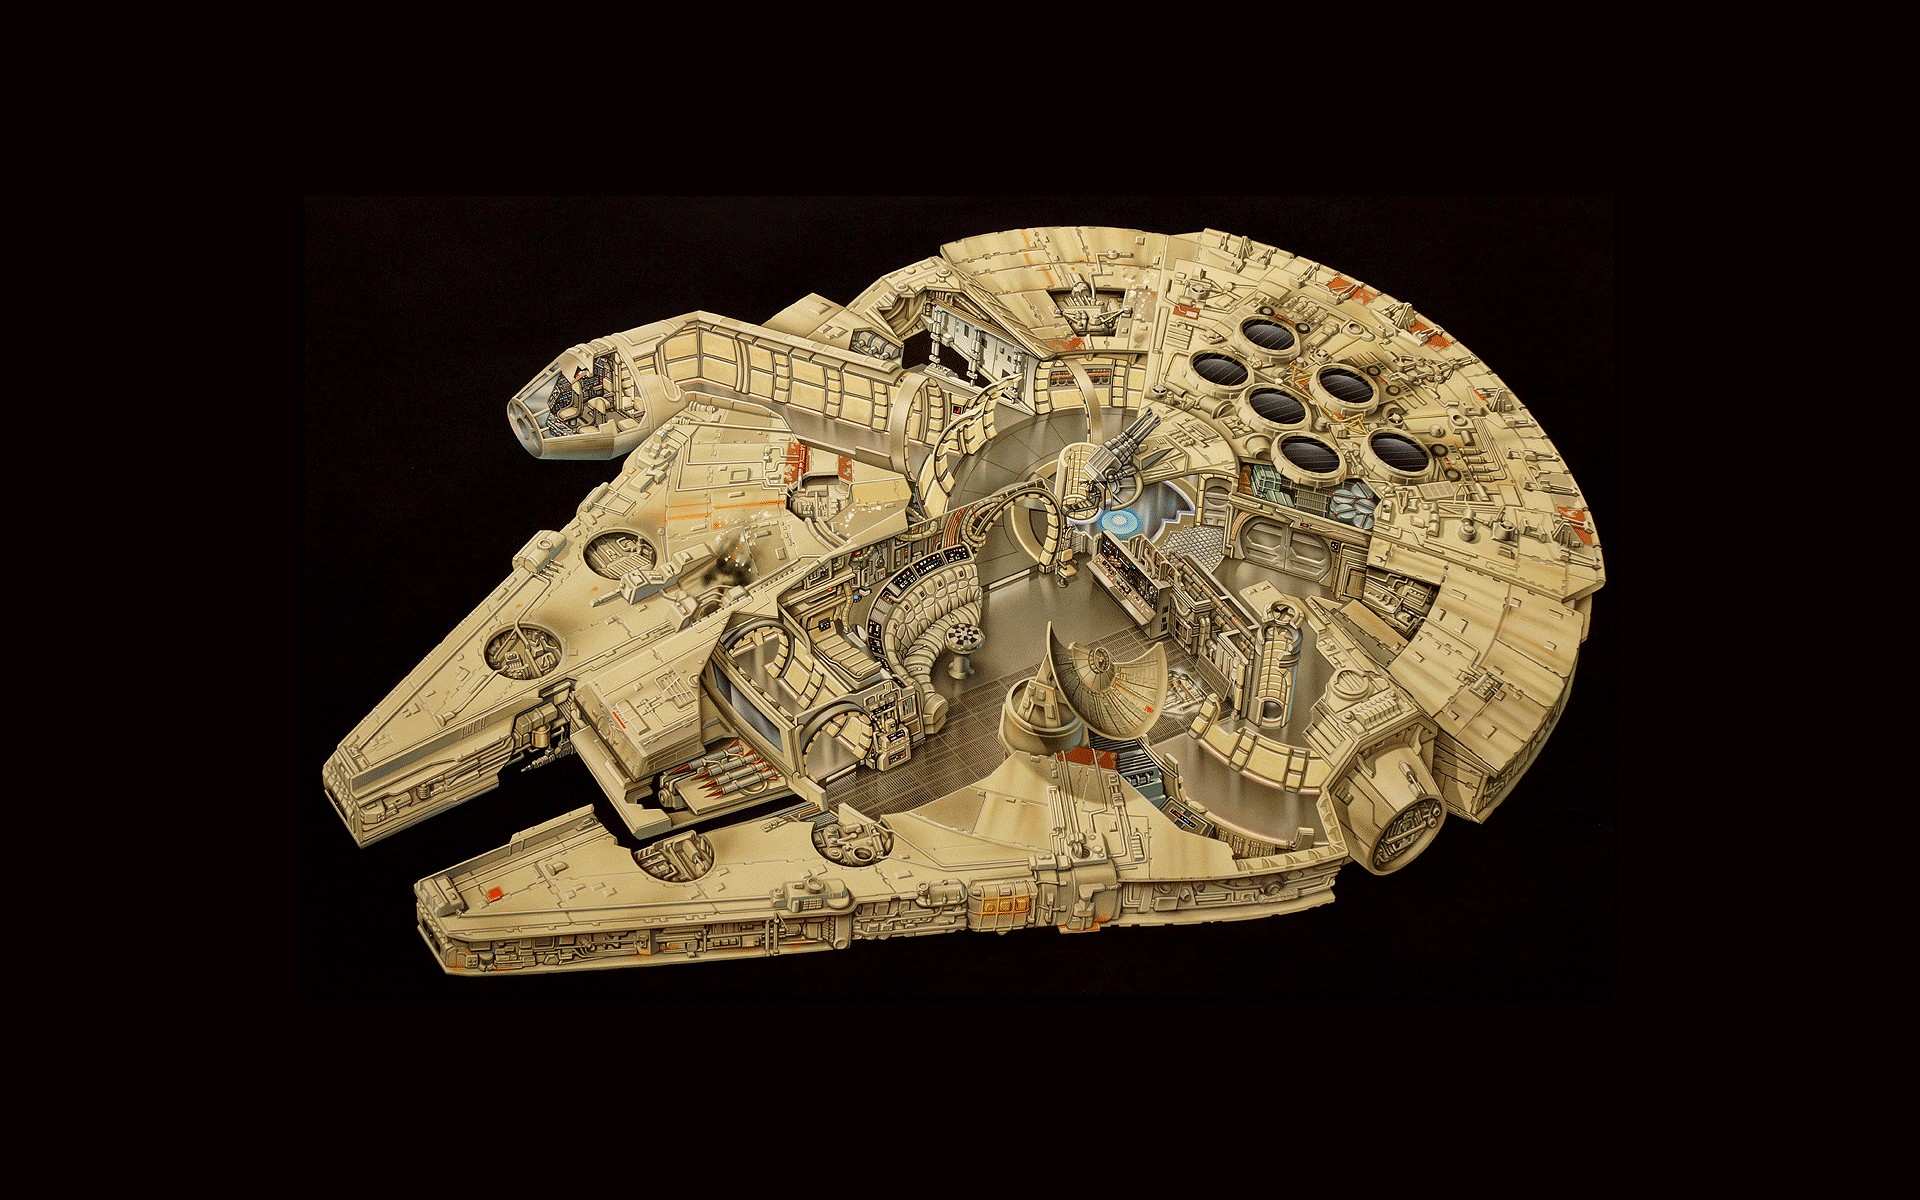 General 1920x1200 Millennium Falcon Star Wars artwork